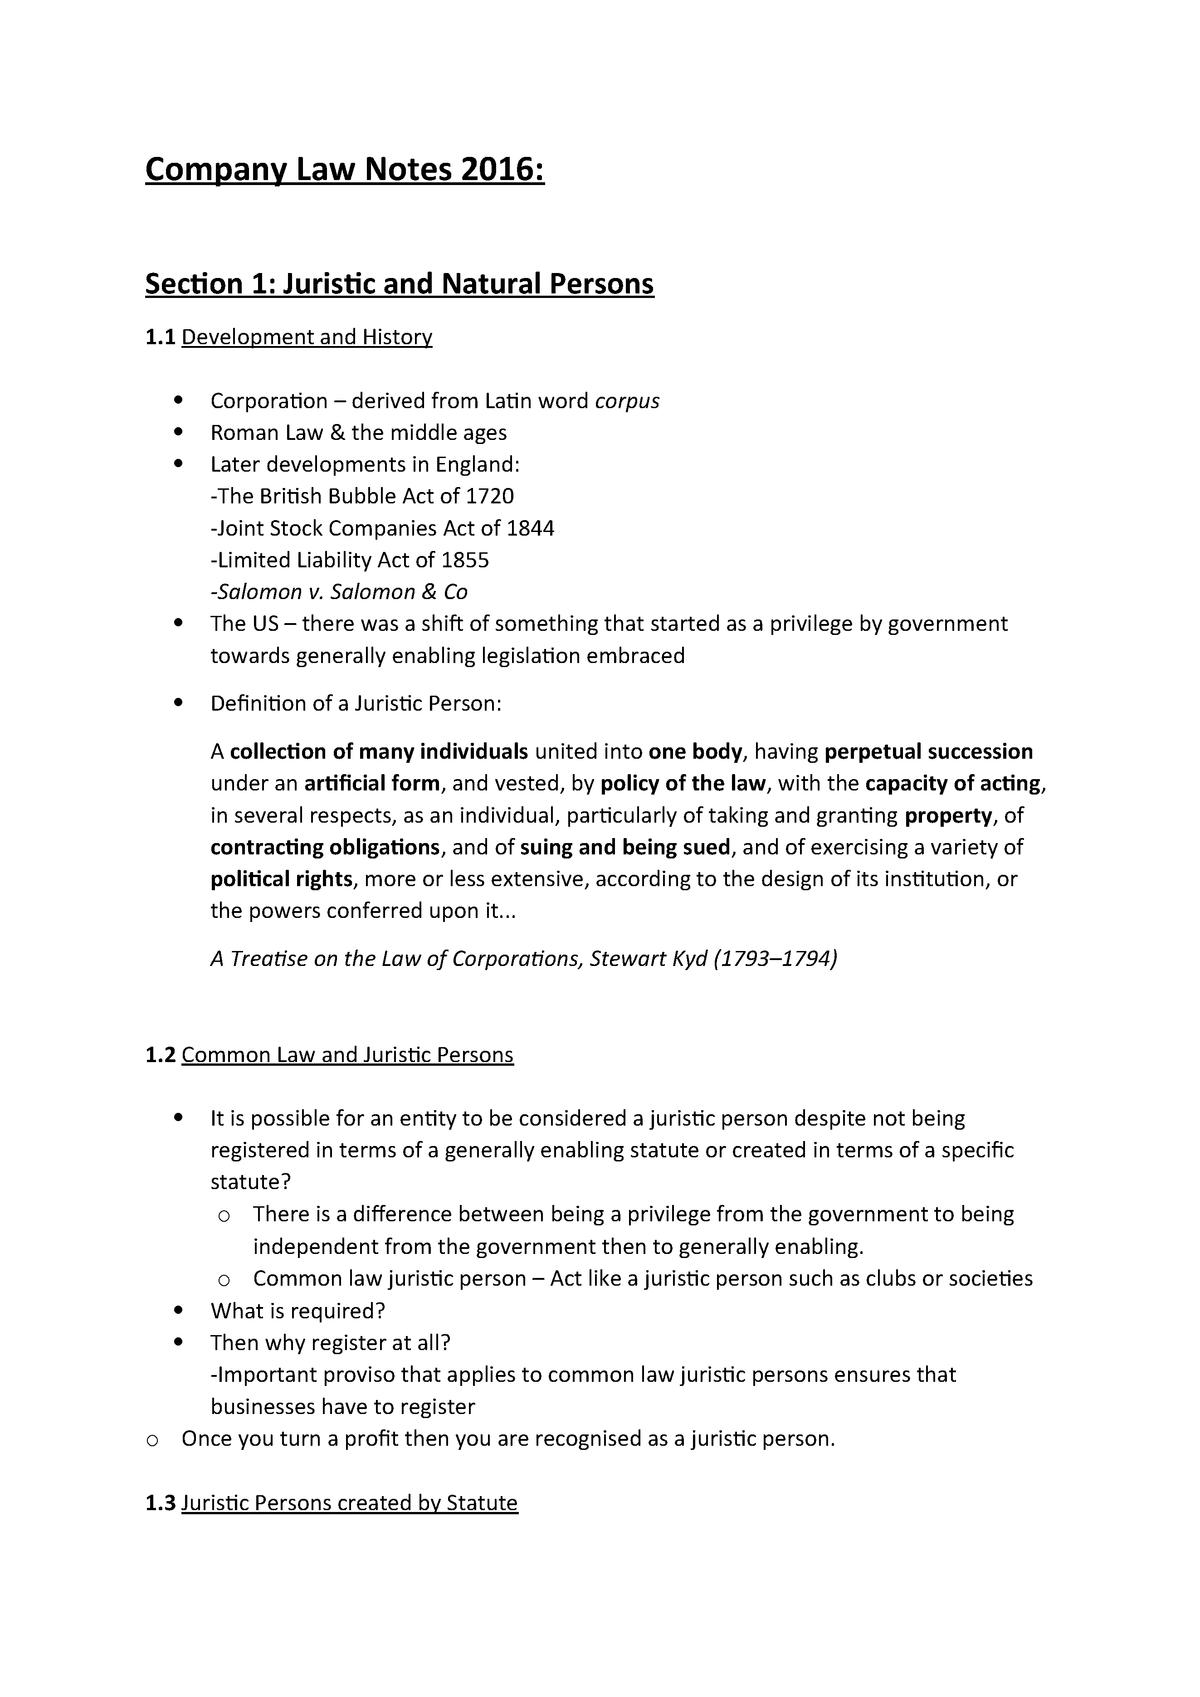 Company law notes - CML2001F - UCT - StuDocu